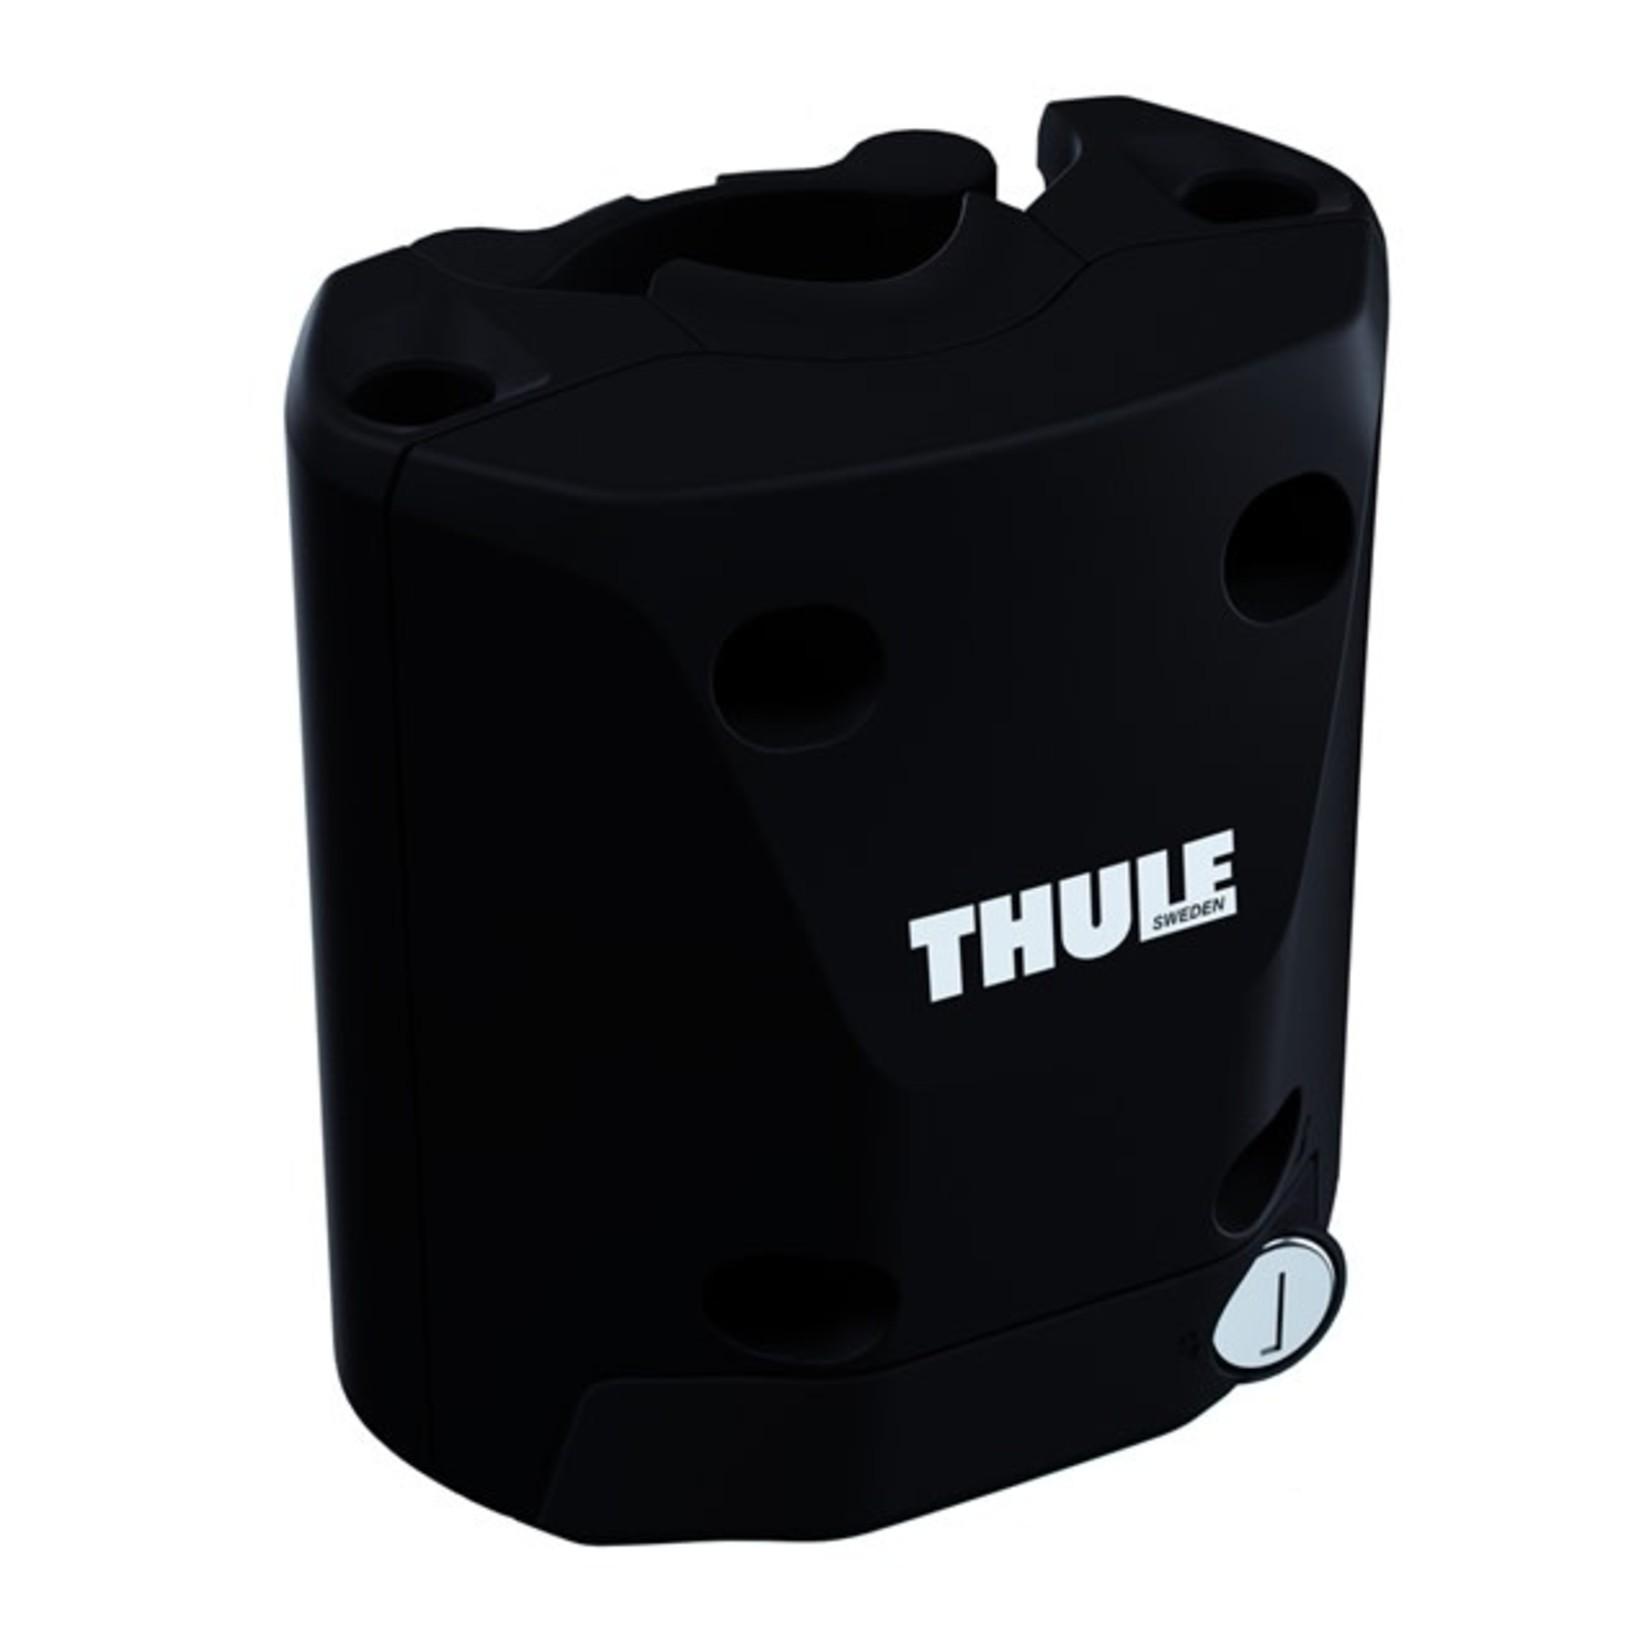 THULE THULE - quick release bracket